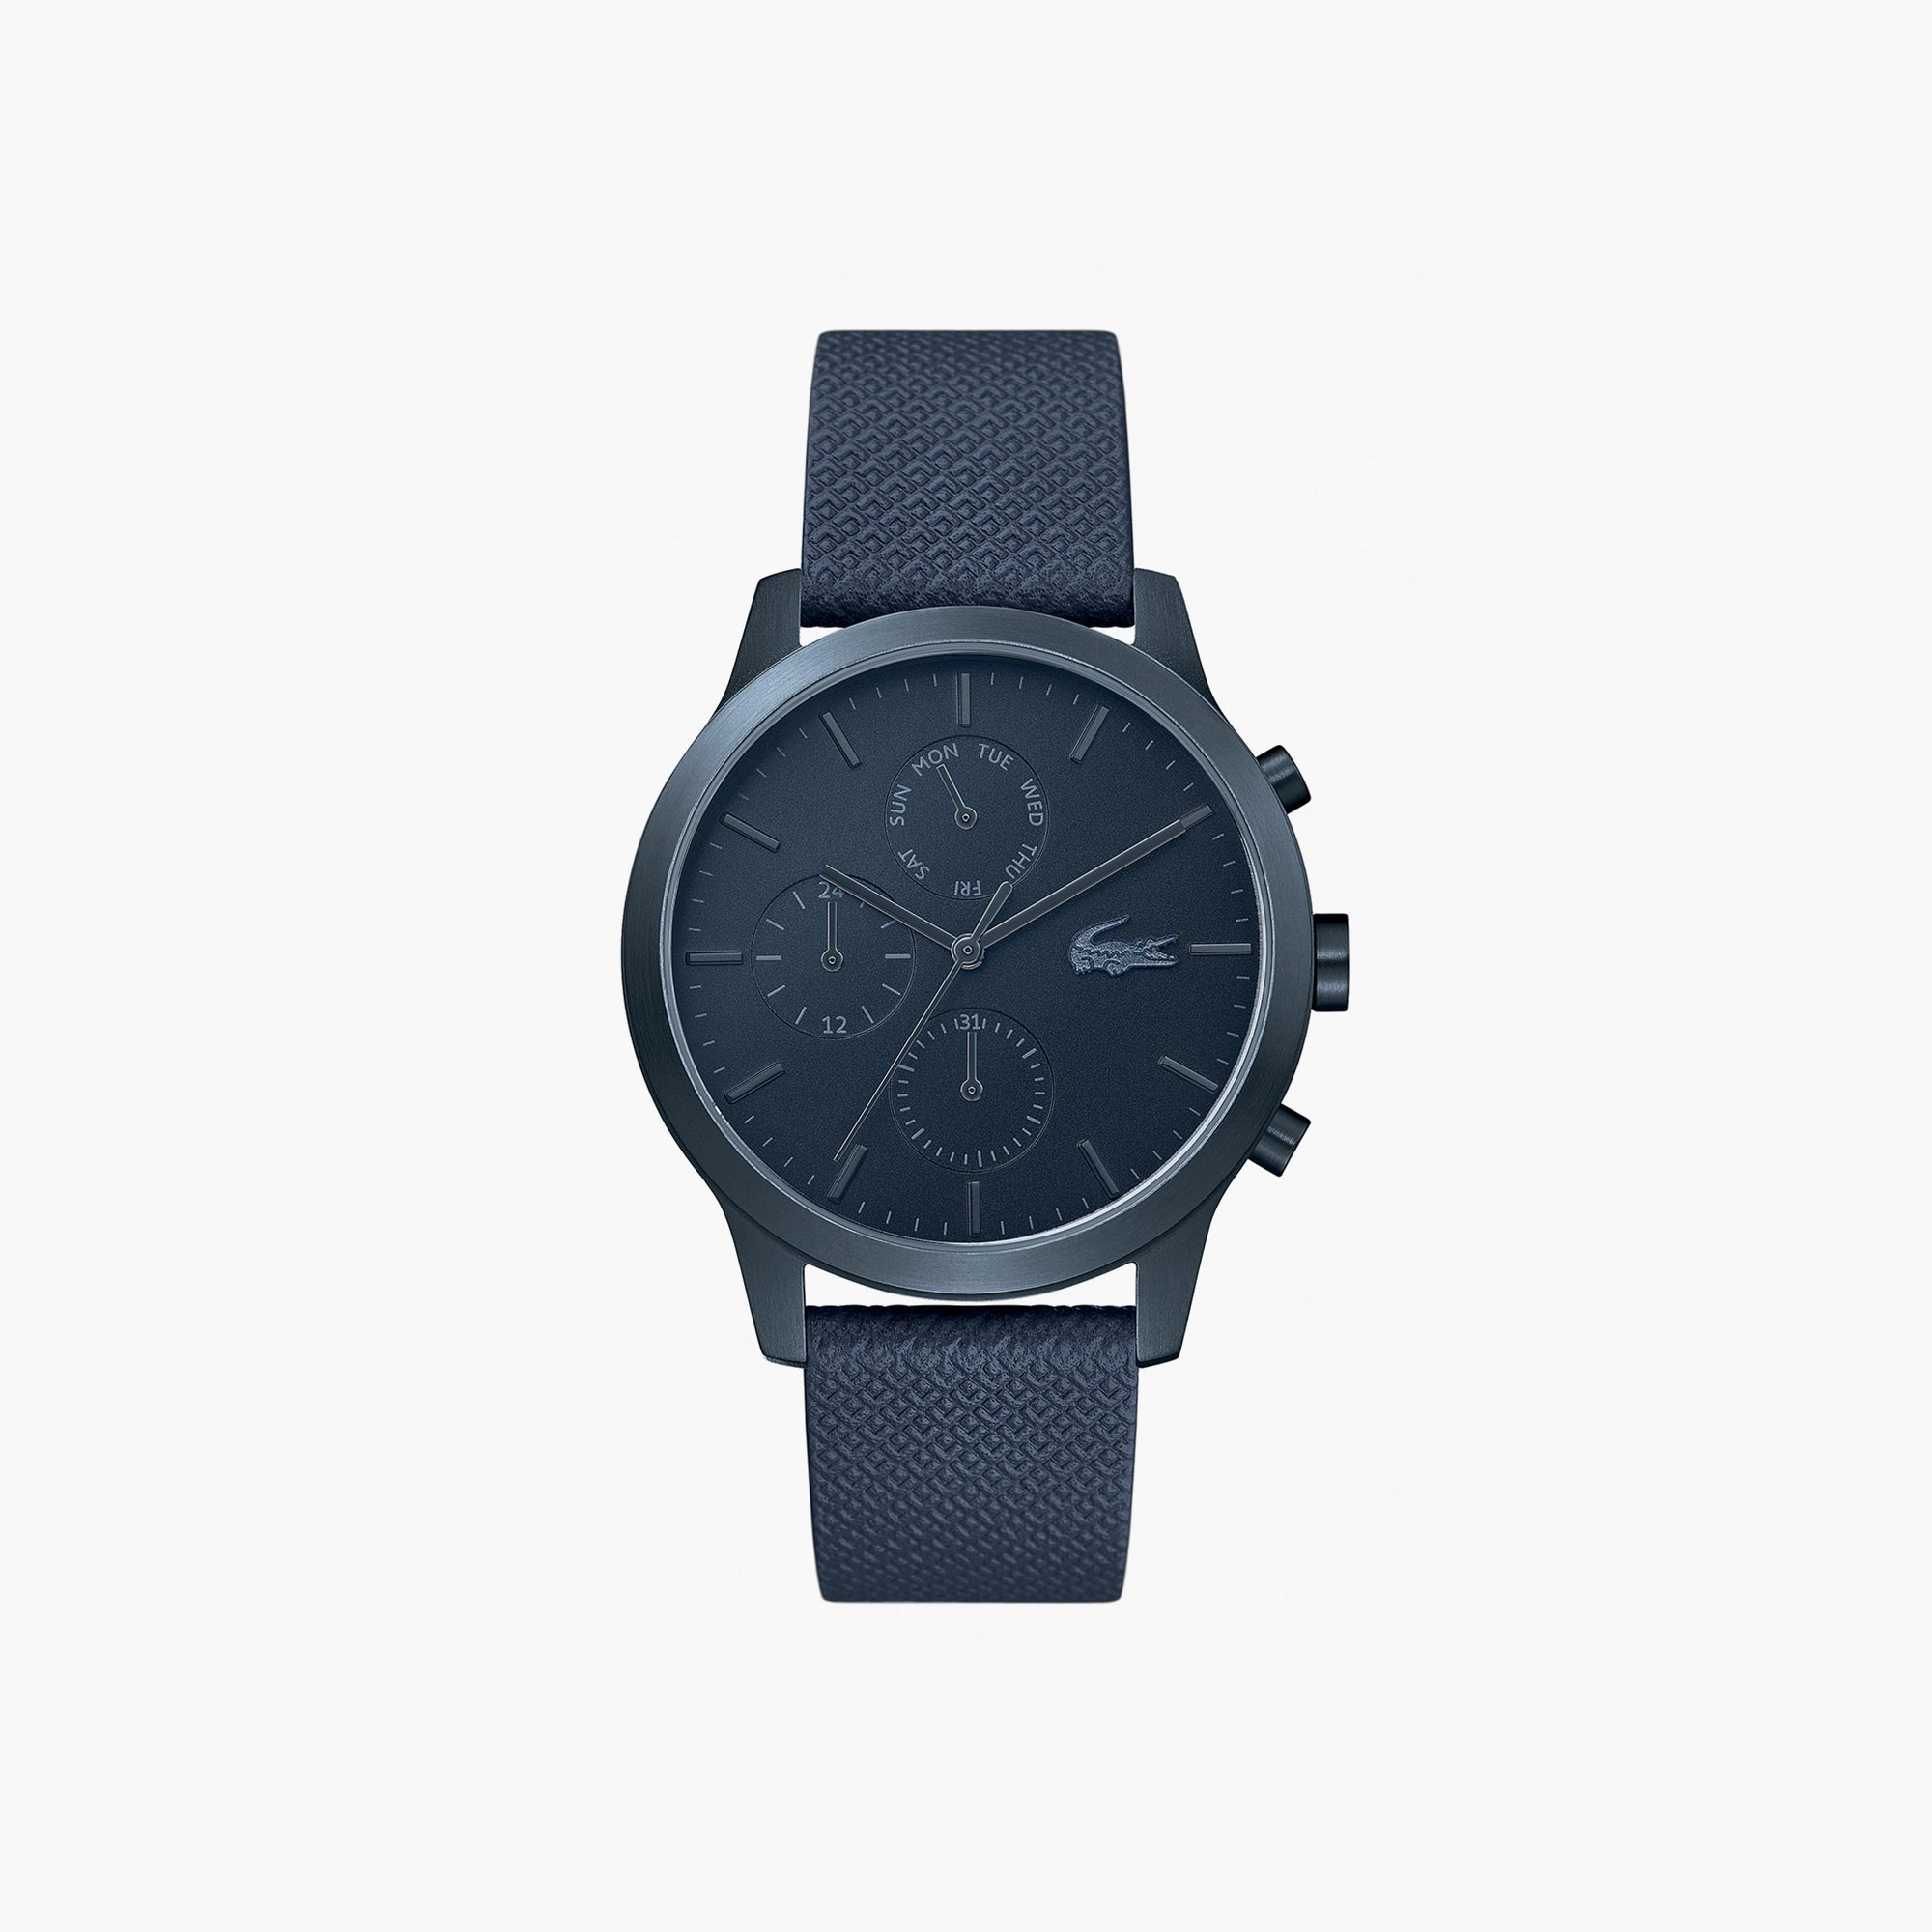 3d882ad535e2 Gents Lacoste.12.12 Watch with Blue Leather Petit Piqué Strap